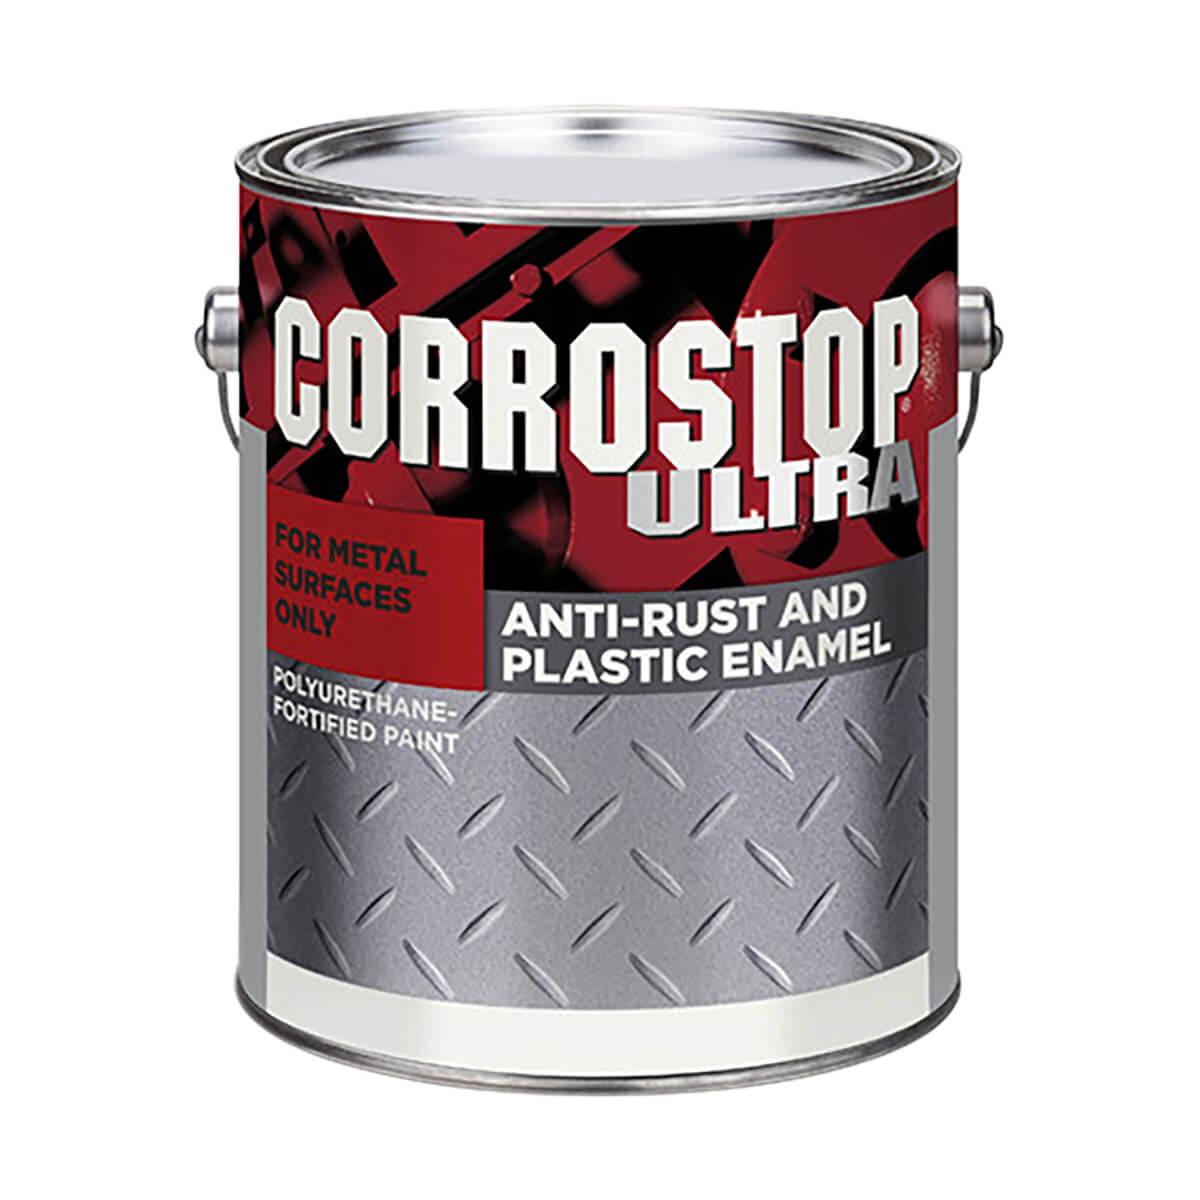 Corrostop - Anti-rust Alkyd Paint - Bright Yellow - 3.78 L